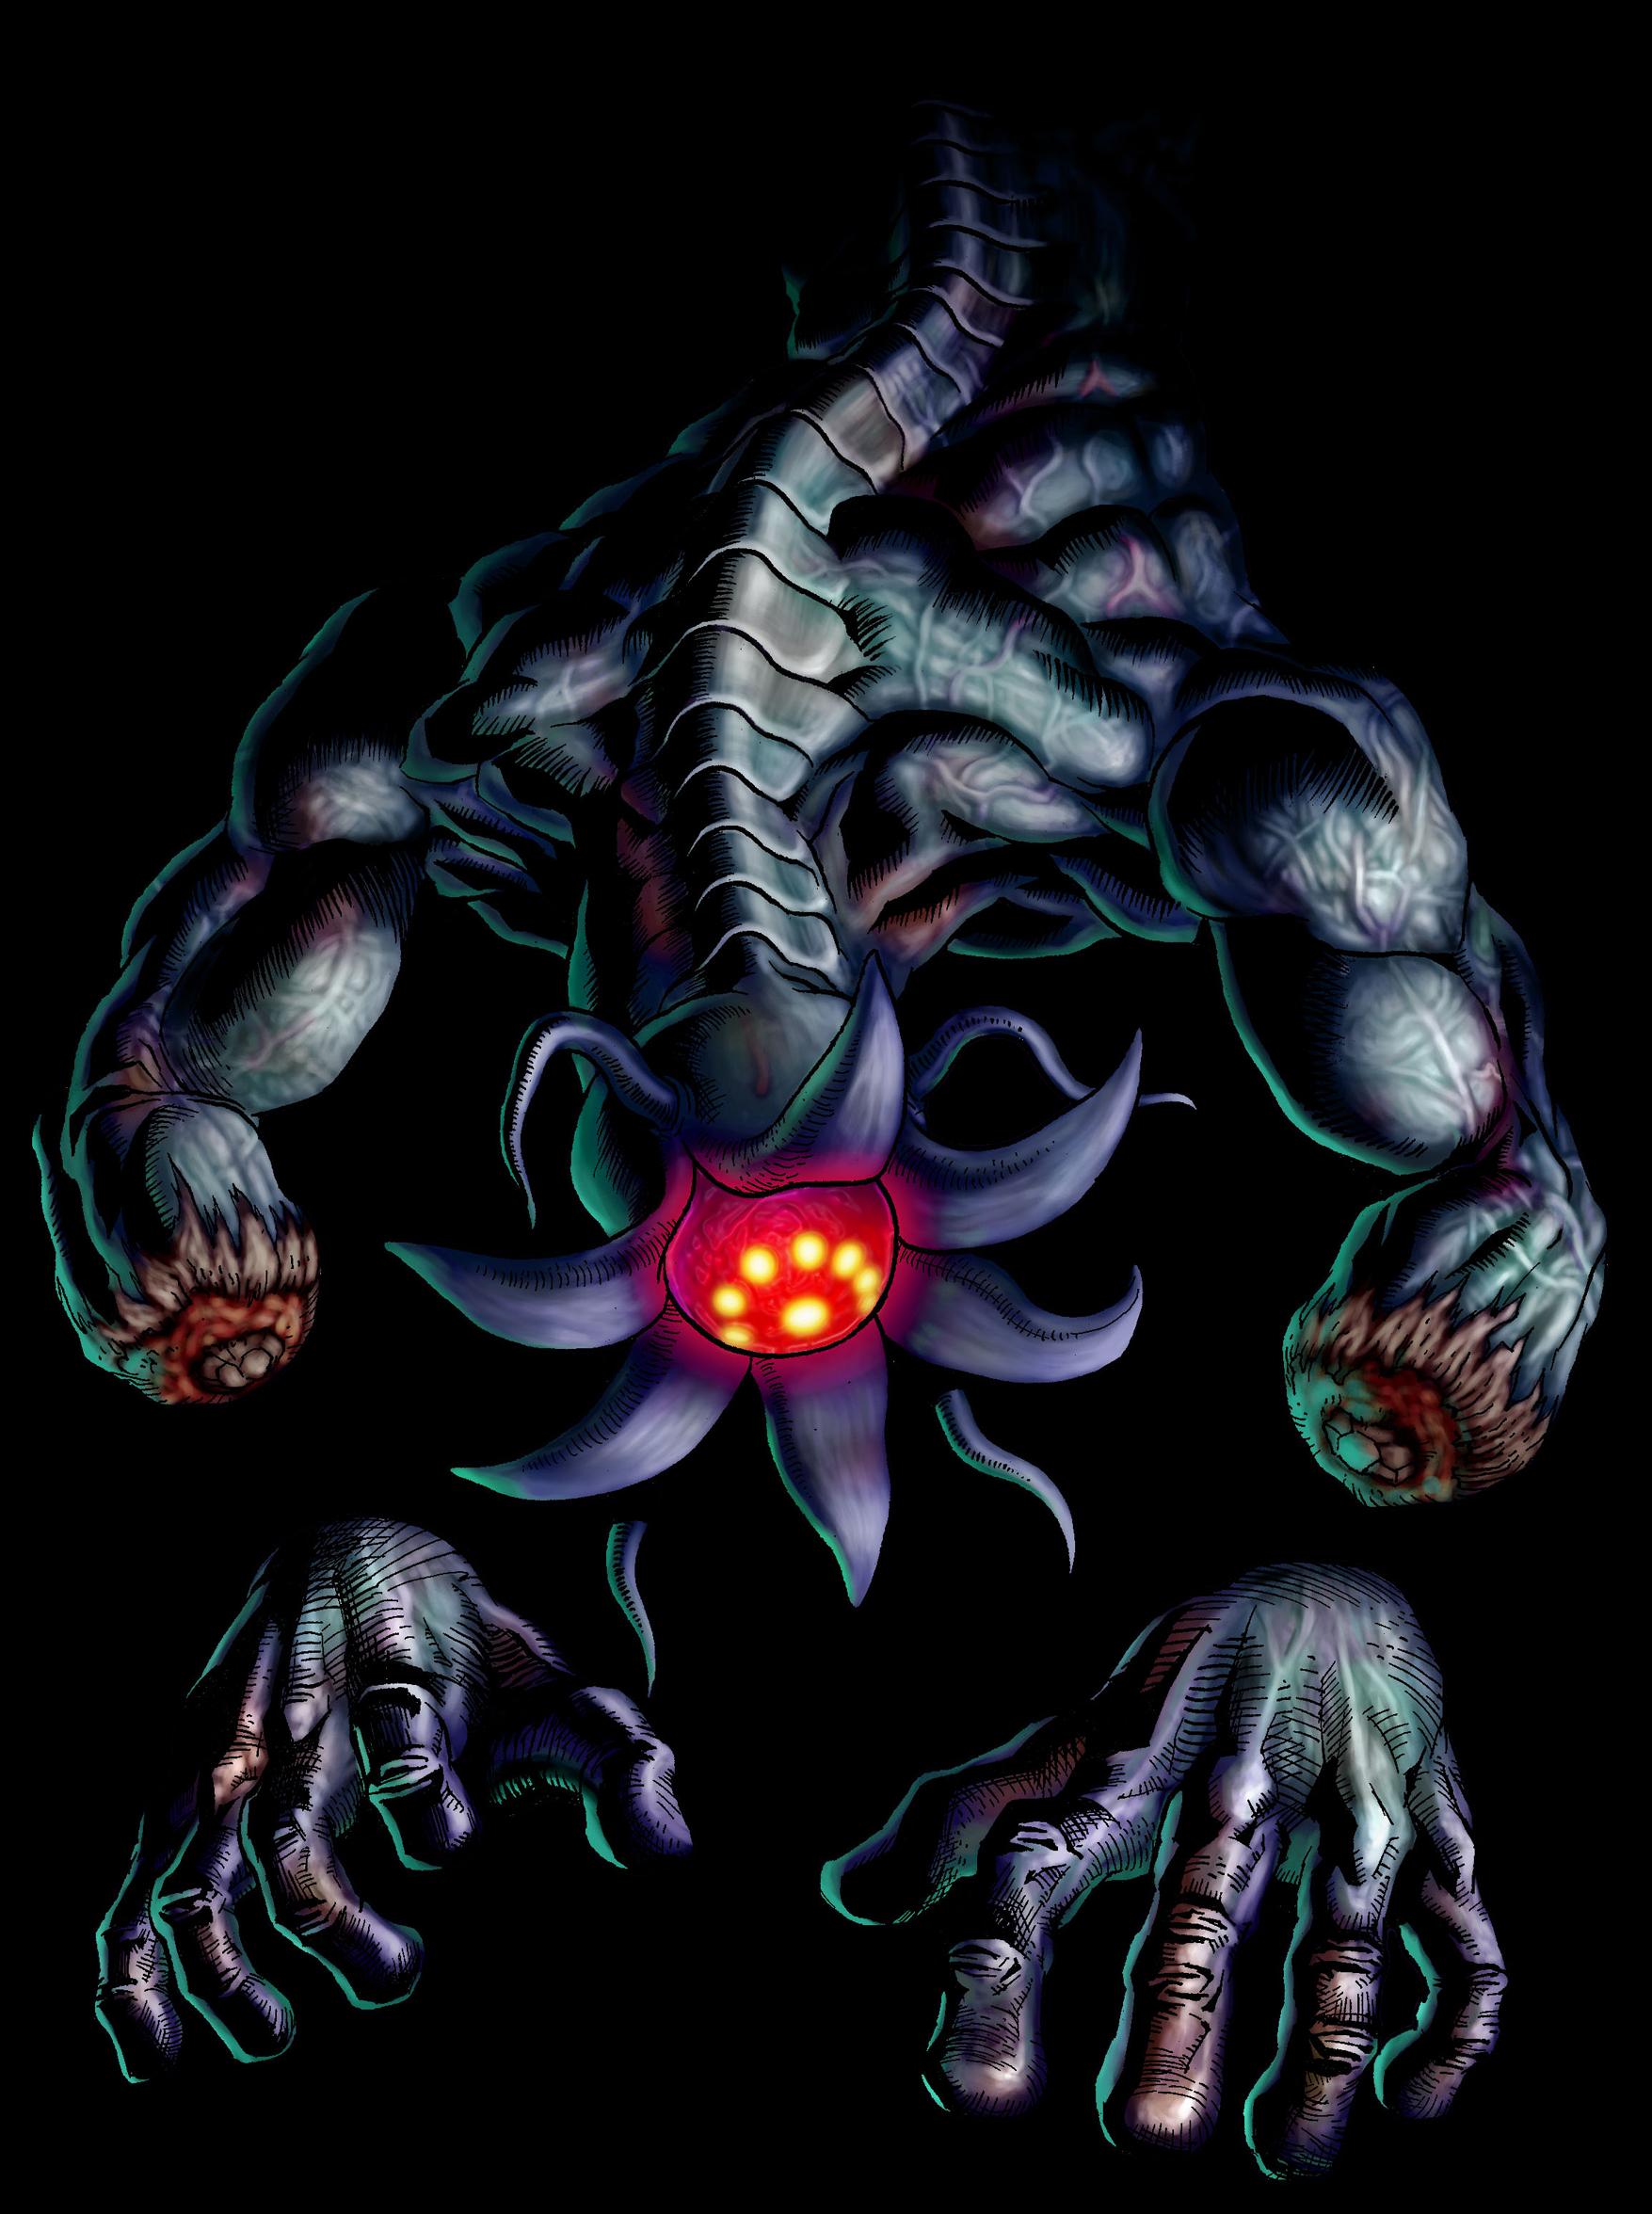 Bongo Bongo, Monstre de l'Ombre